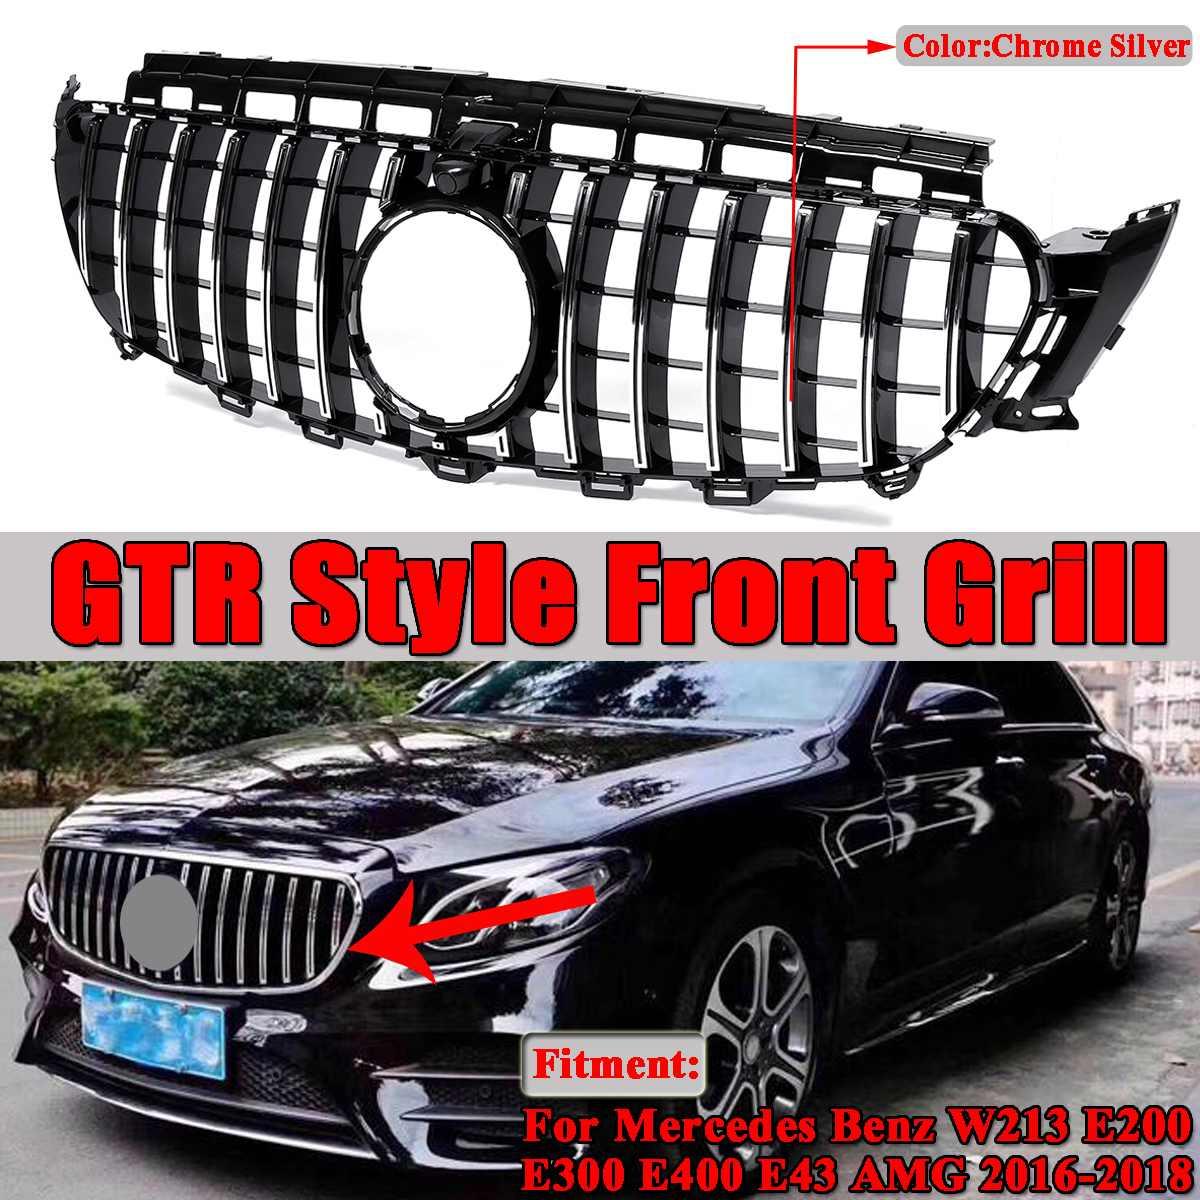 1x GT R/Diamant Stil W213 Grlil Auto Kühlergrill Für Mercedes Für Benz W213 E200 E300 E400 E43 für AMG 2016 2017 2018 2019